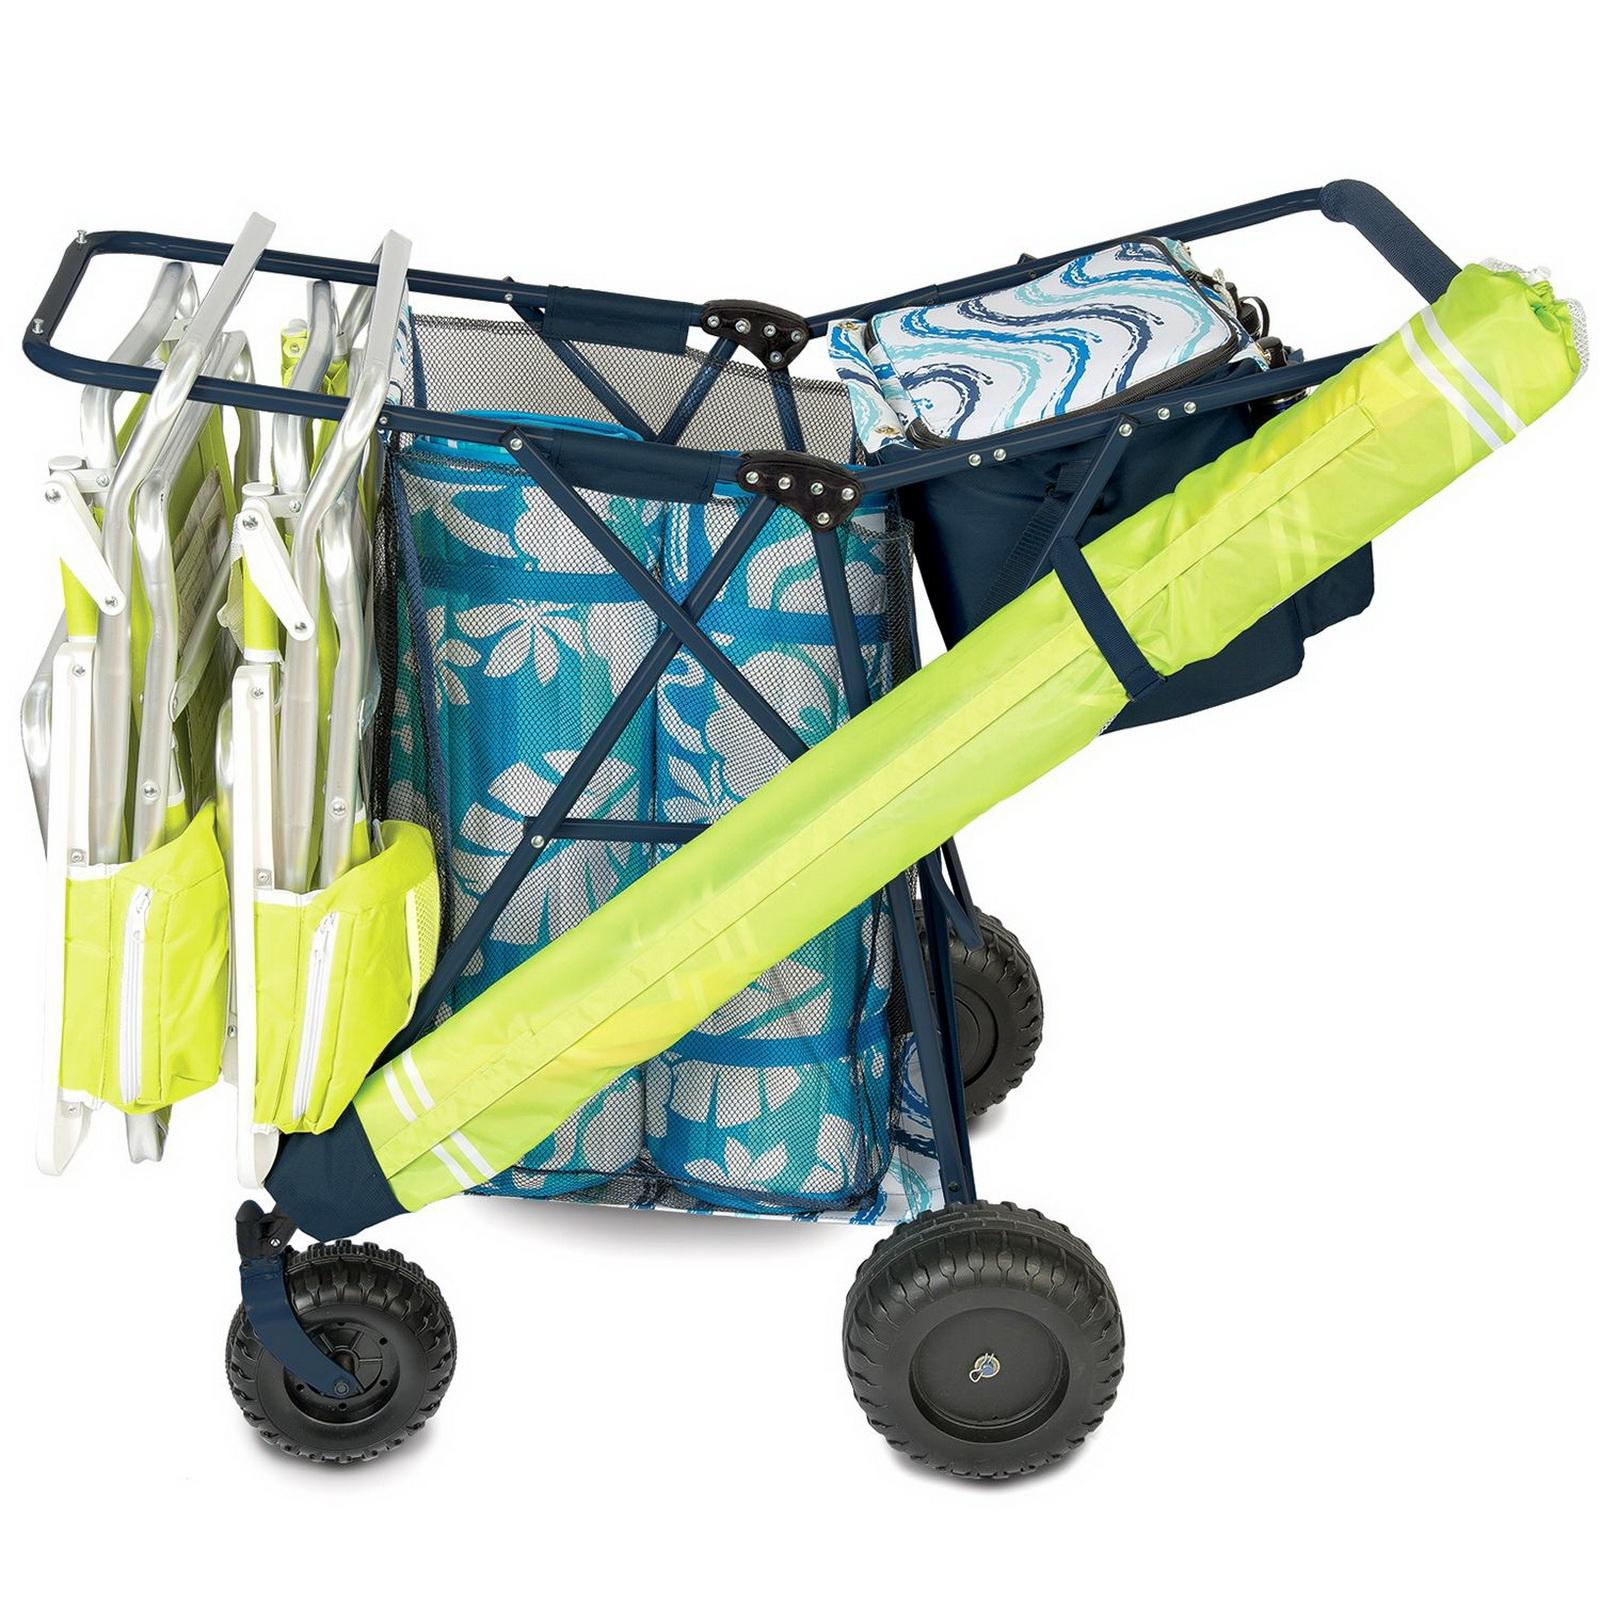 Big Folding Beach Cart Amp Portable Cooler Shopping Gear